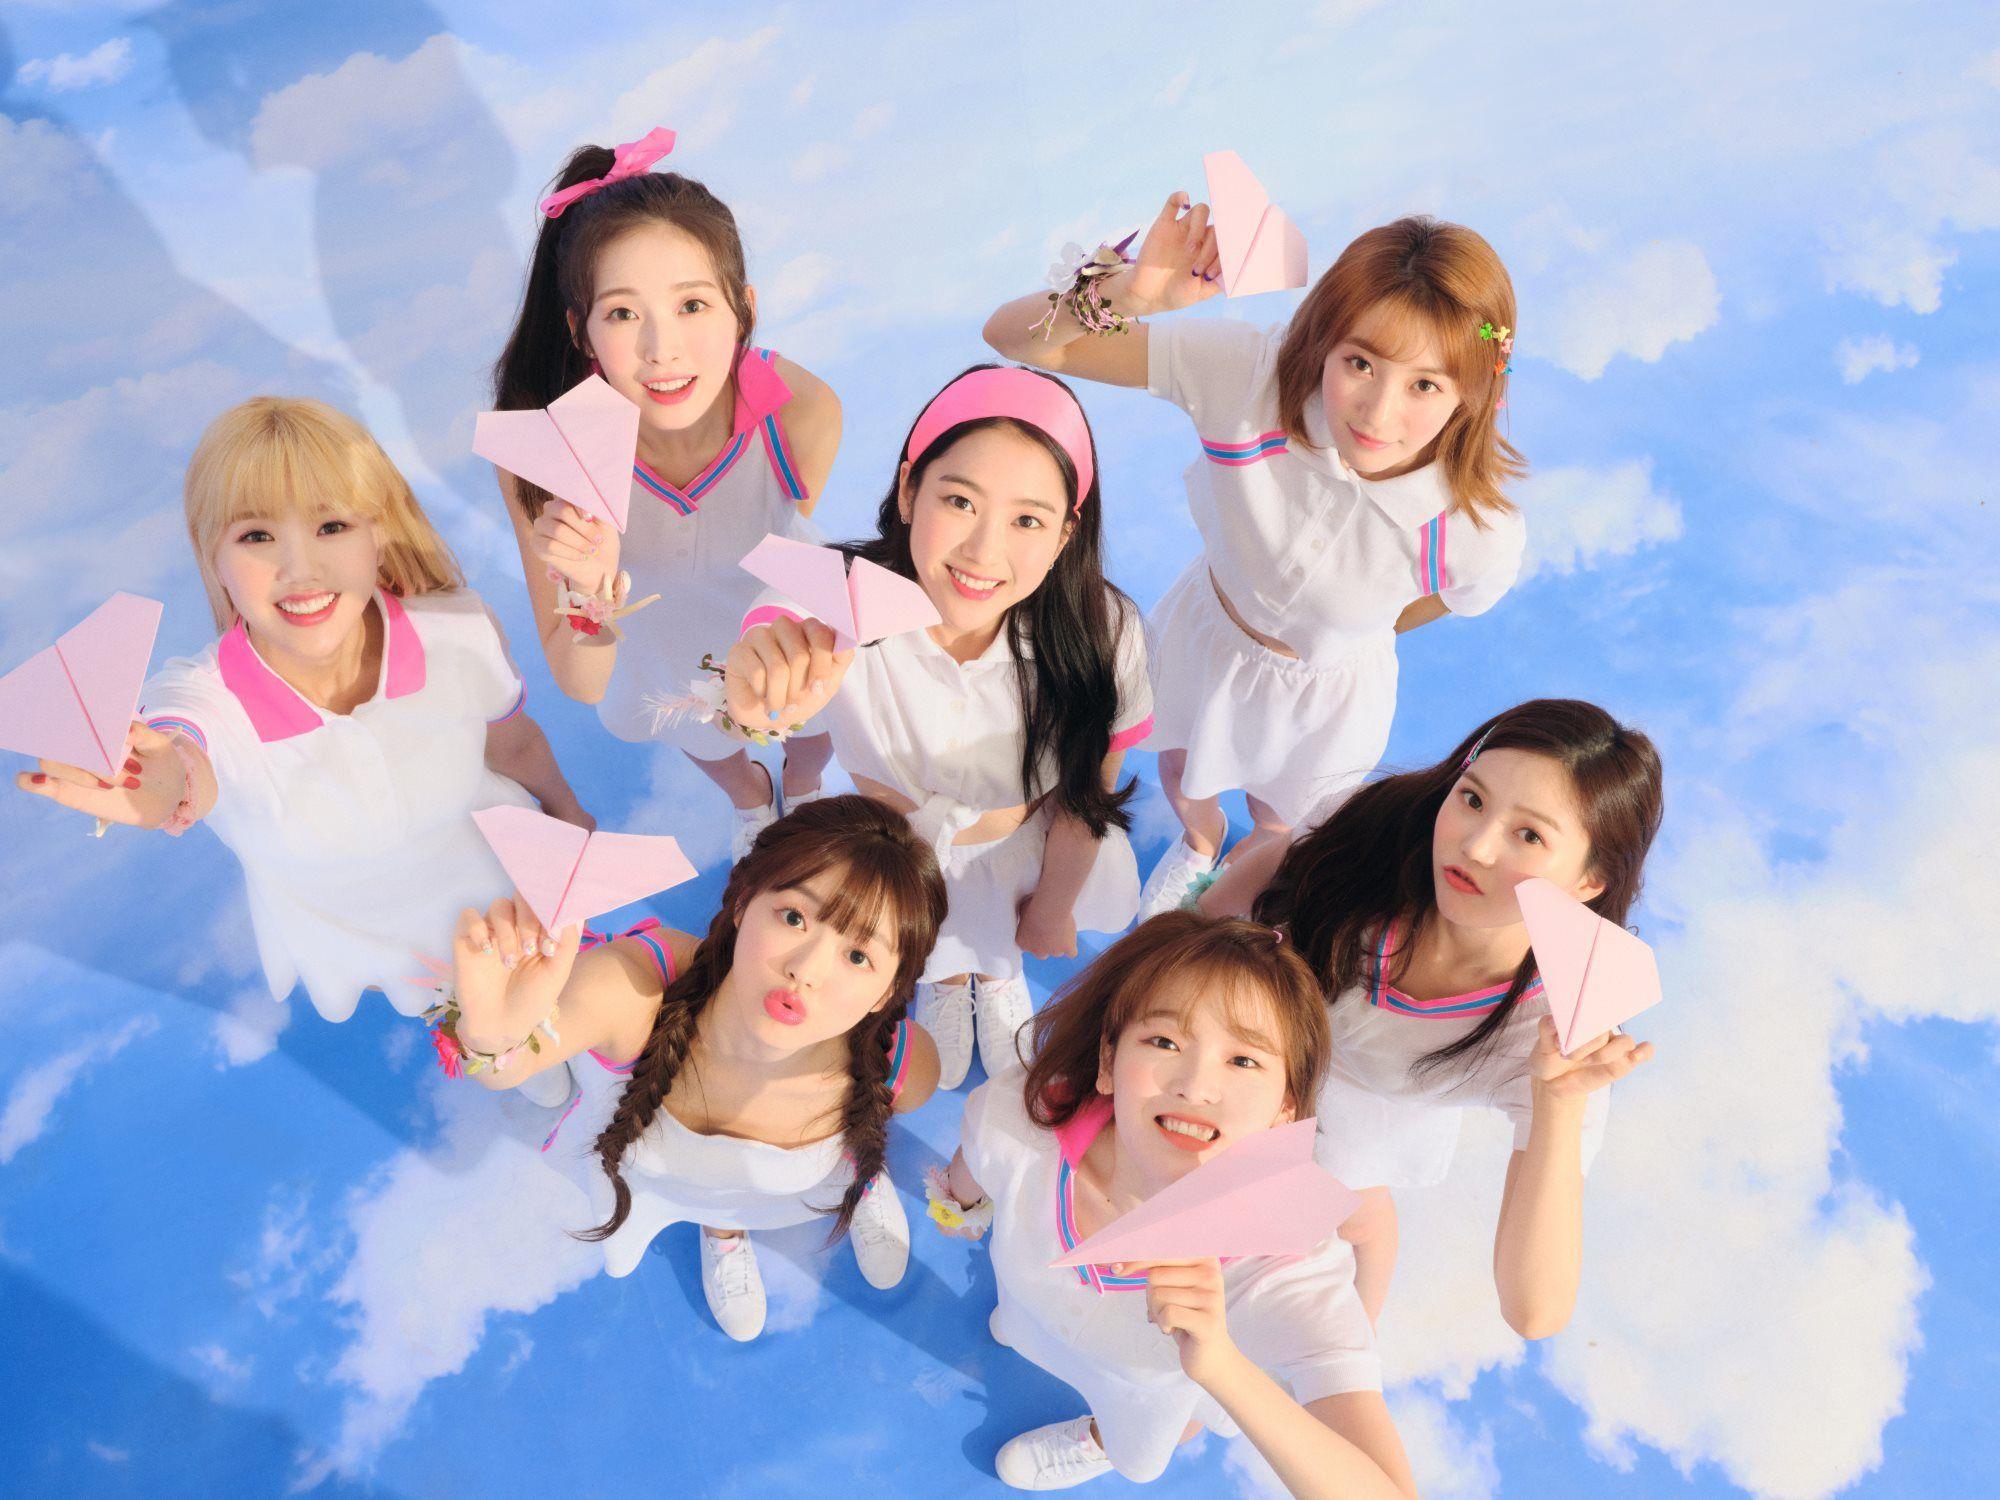 Pin by Naseyo Vinnins on ♡ Oh My Girl ♡ YooA | Oh my girl